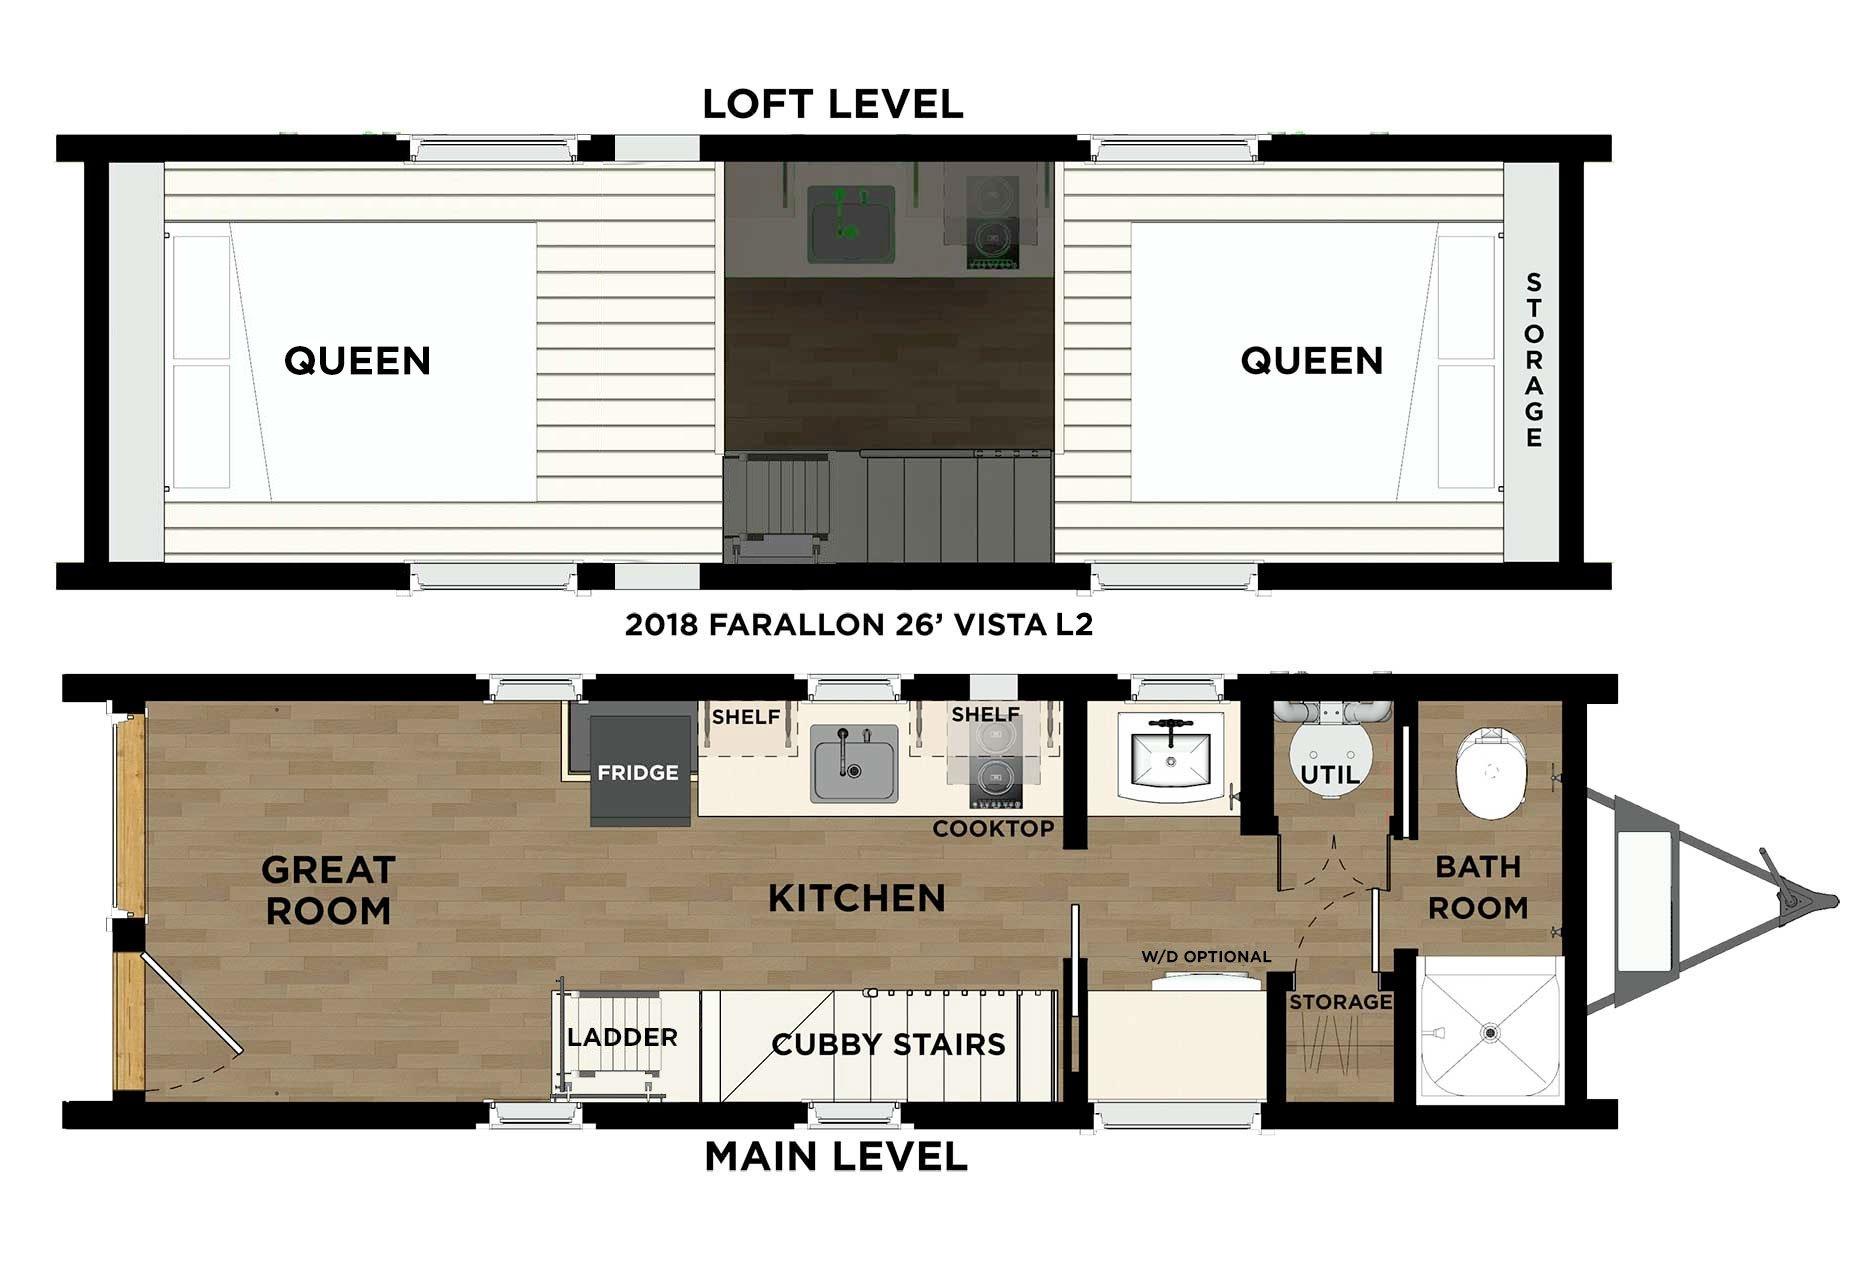 2018 Farallon Vista L2 Floor Plan